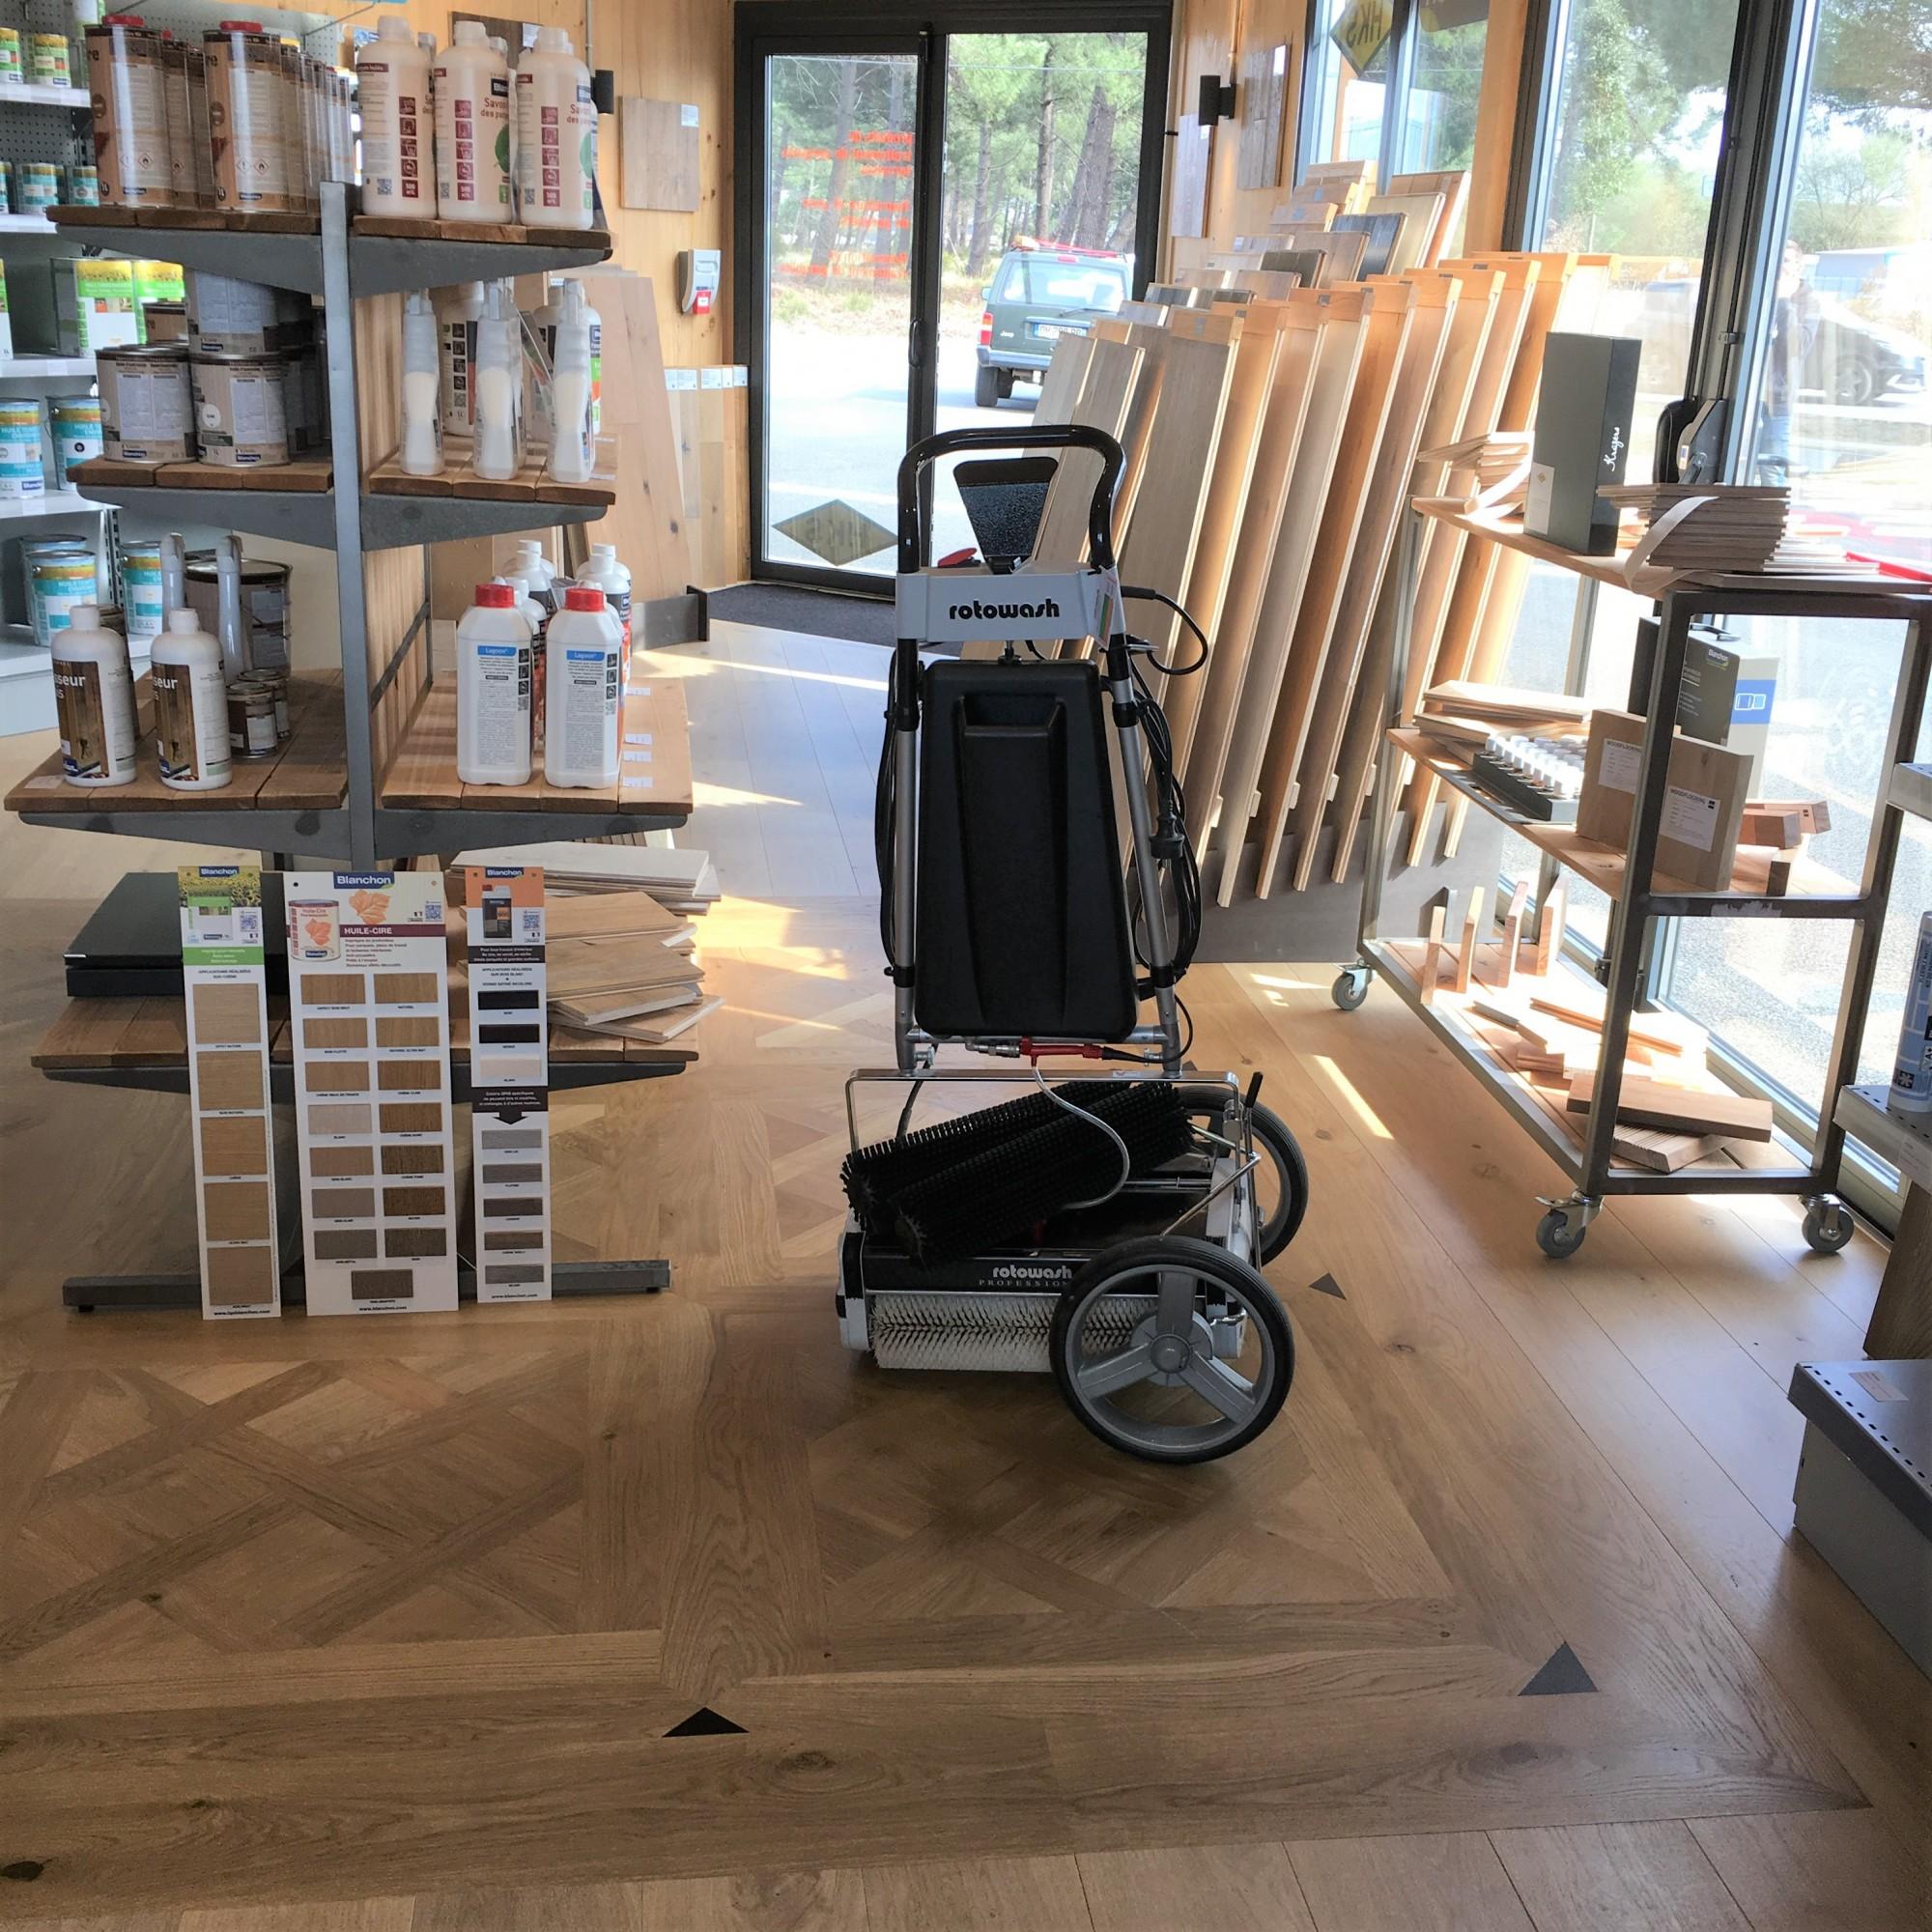 Produit Pour Nettoyer Terrasse En Bois machine de nettoyage pour terrasses et sols en bois osmo